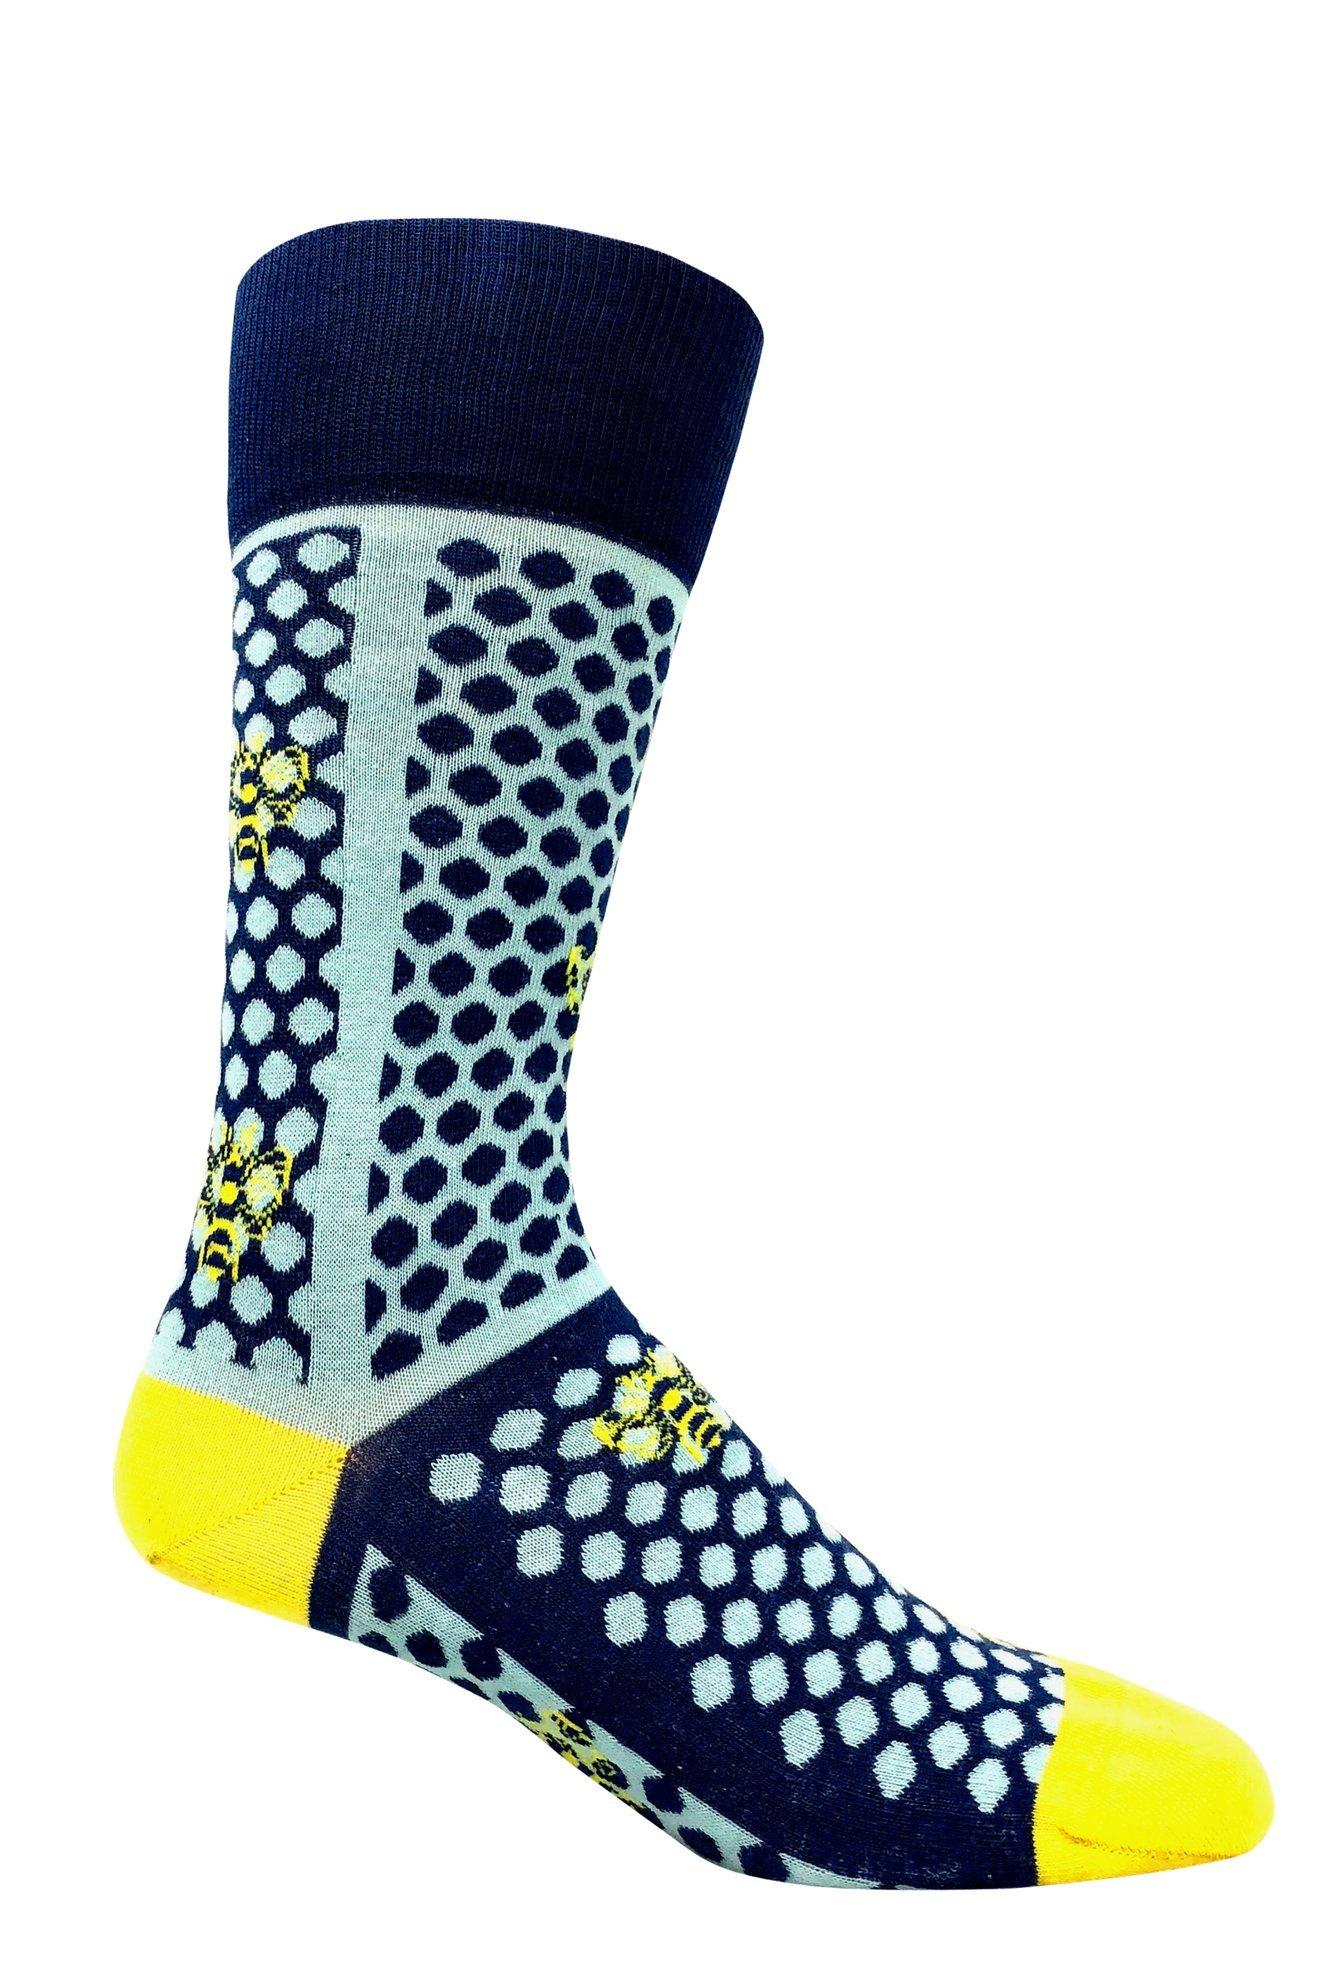 LOVE SOCK COMPANY Men's premium organic cotton patterned casual socks - Bee Dots Light Blue